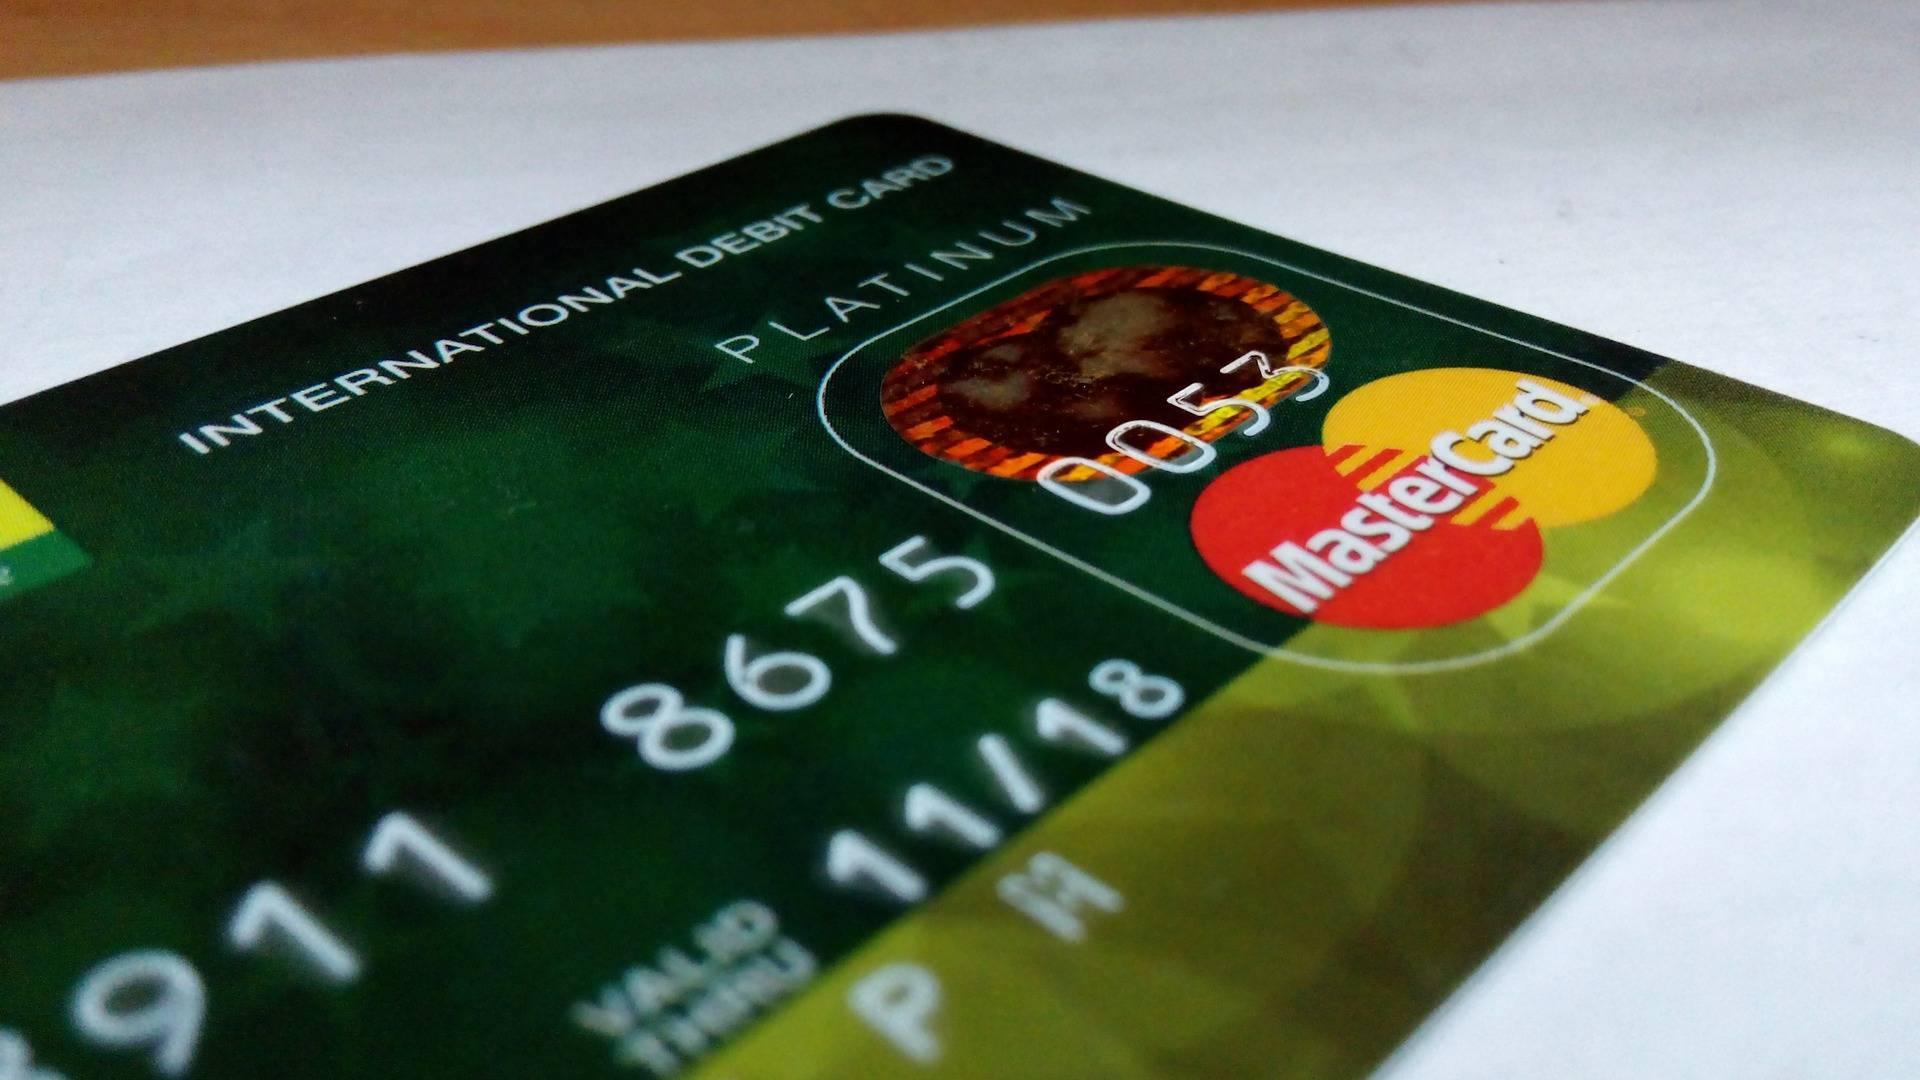 6d8dd5c6432e97981cc1_international-debit-card-388996_1920.jpg